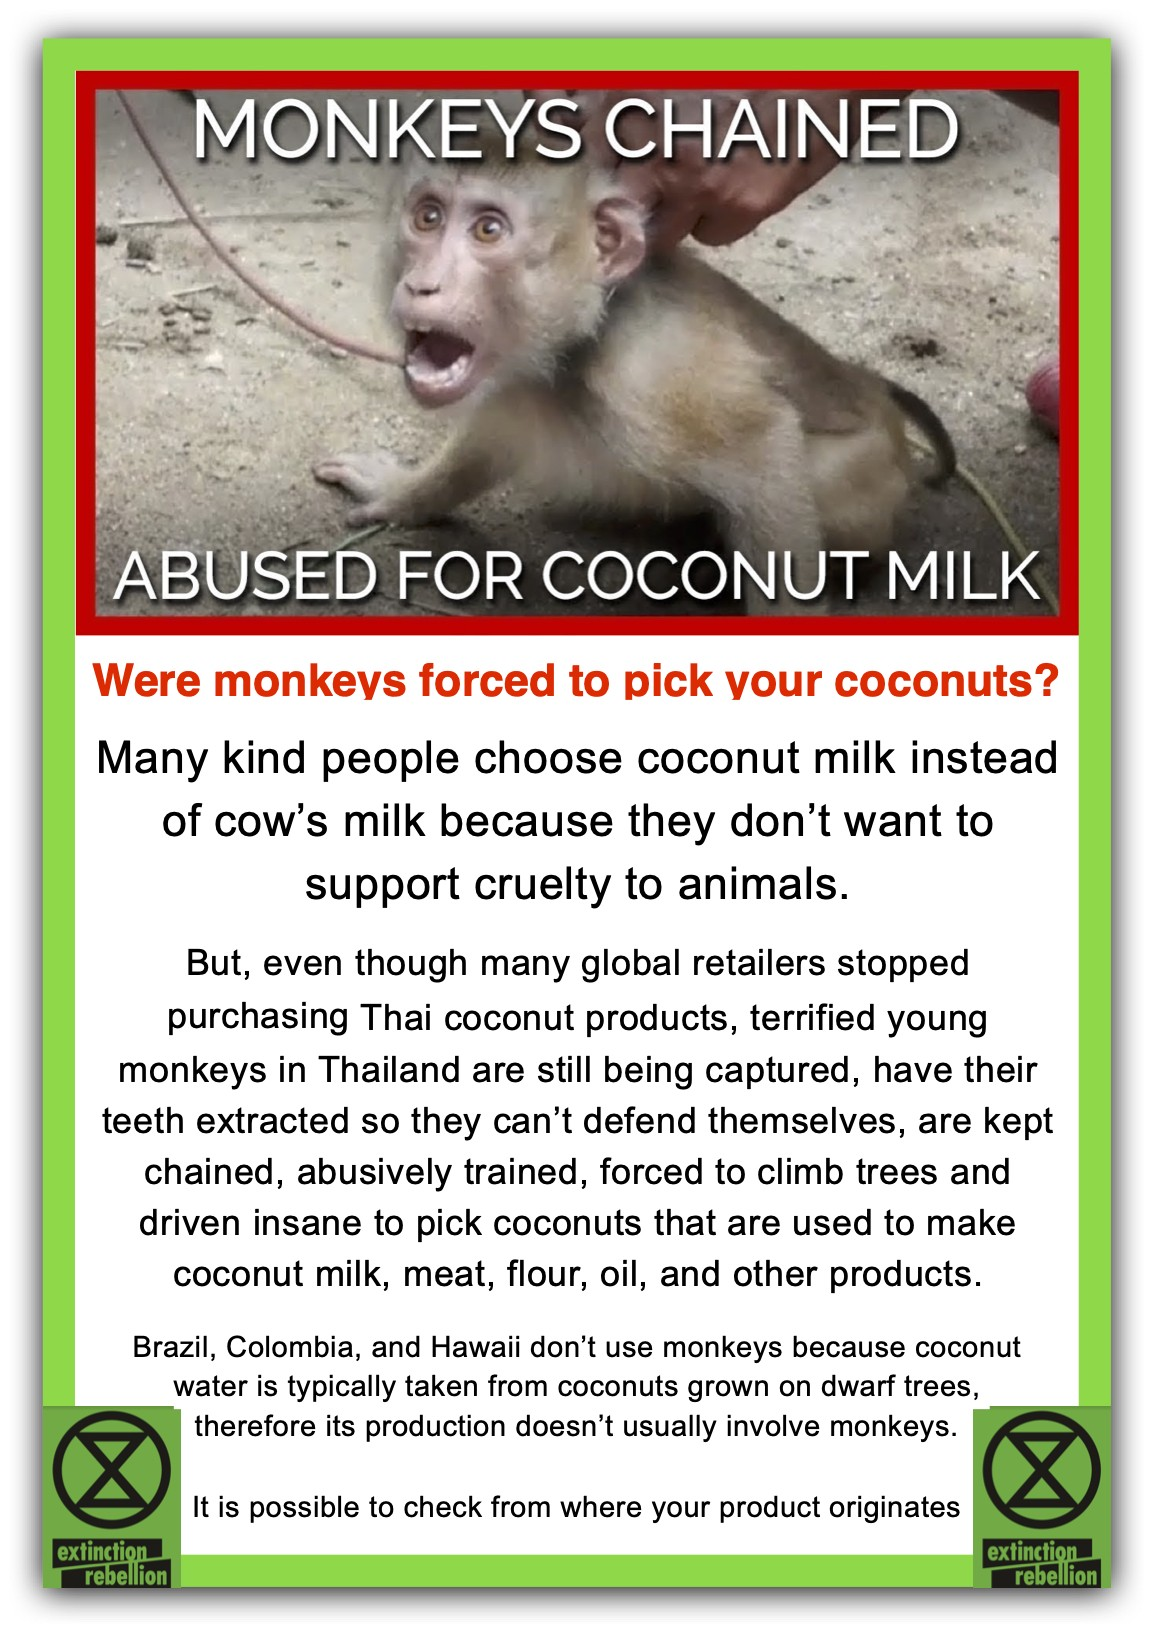 Monkeys-abused-in-coconut-industry-jpeg.jpg